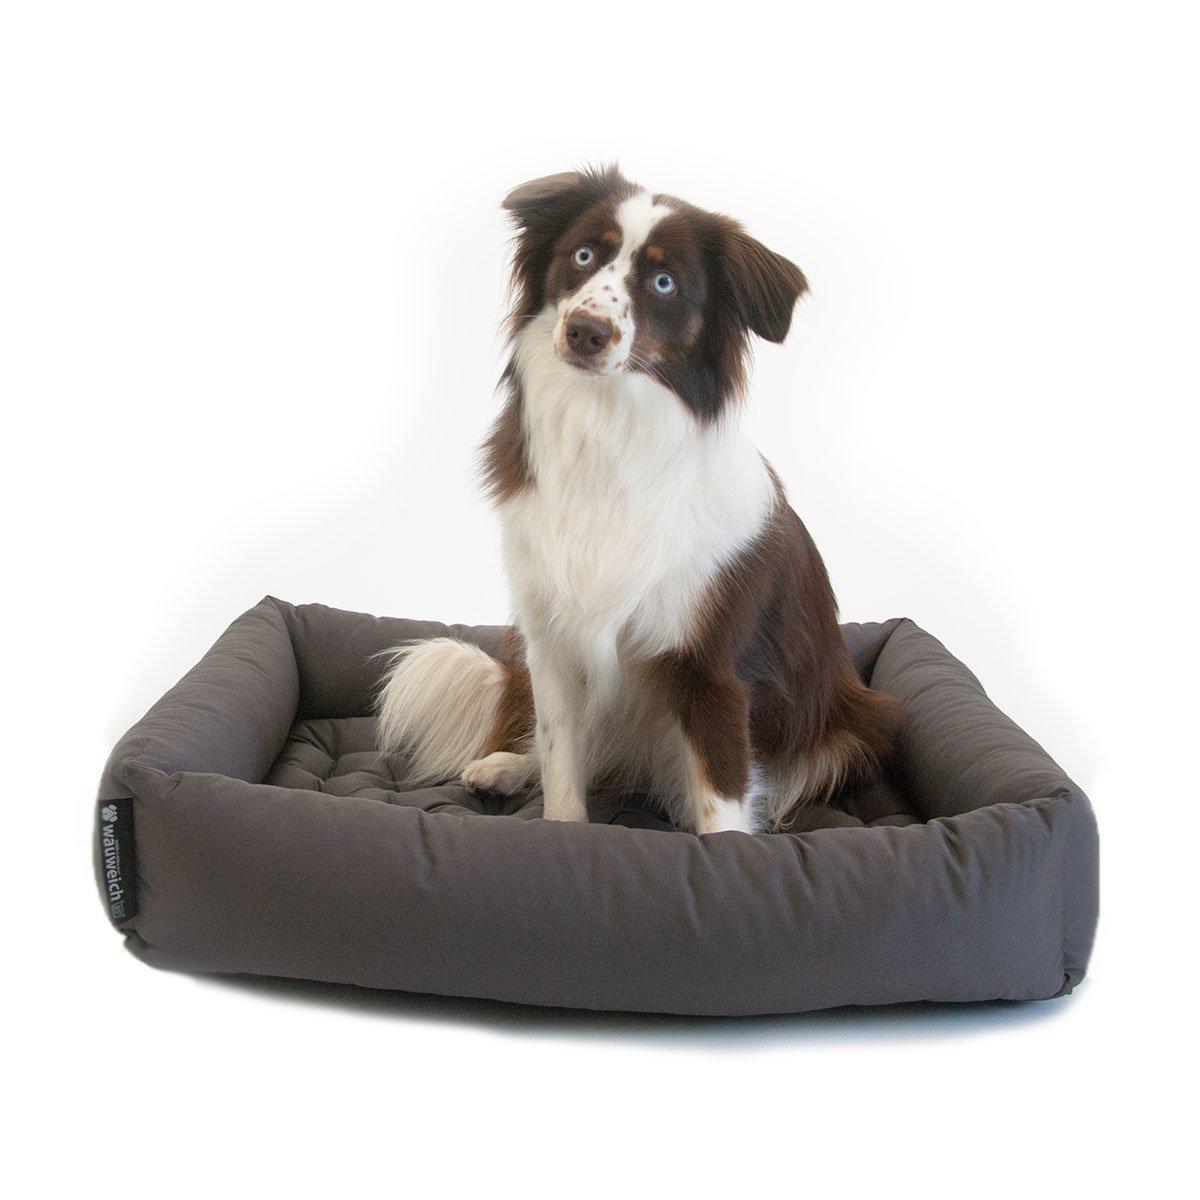 95 Grad Hundebett mit Einlegekissen Bild 2